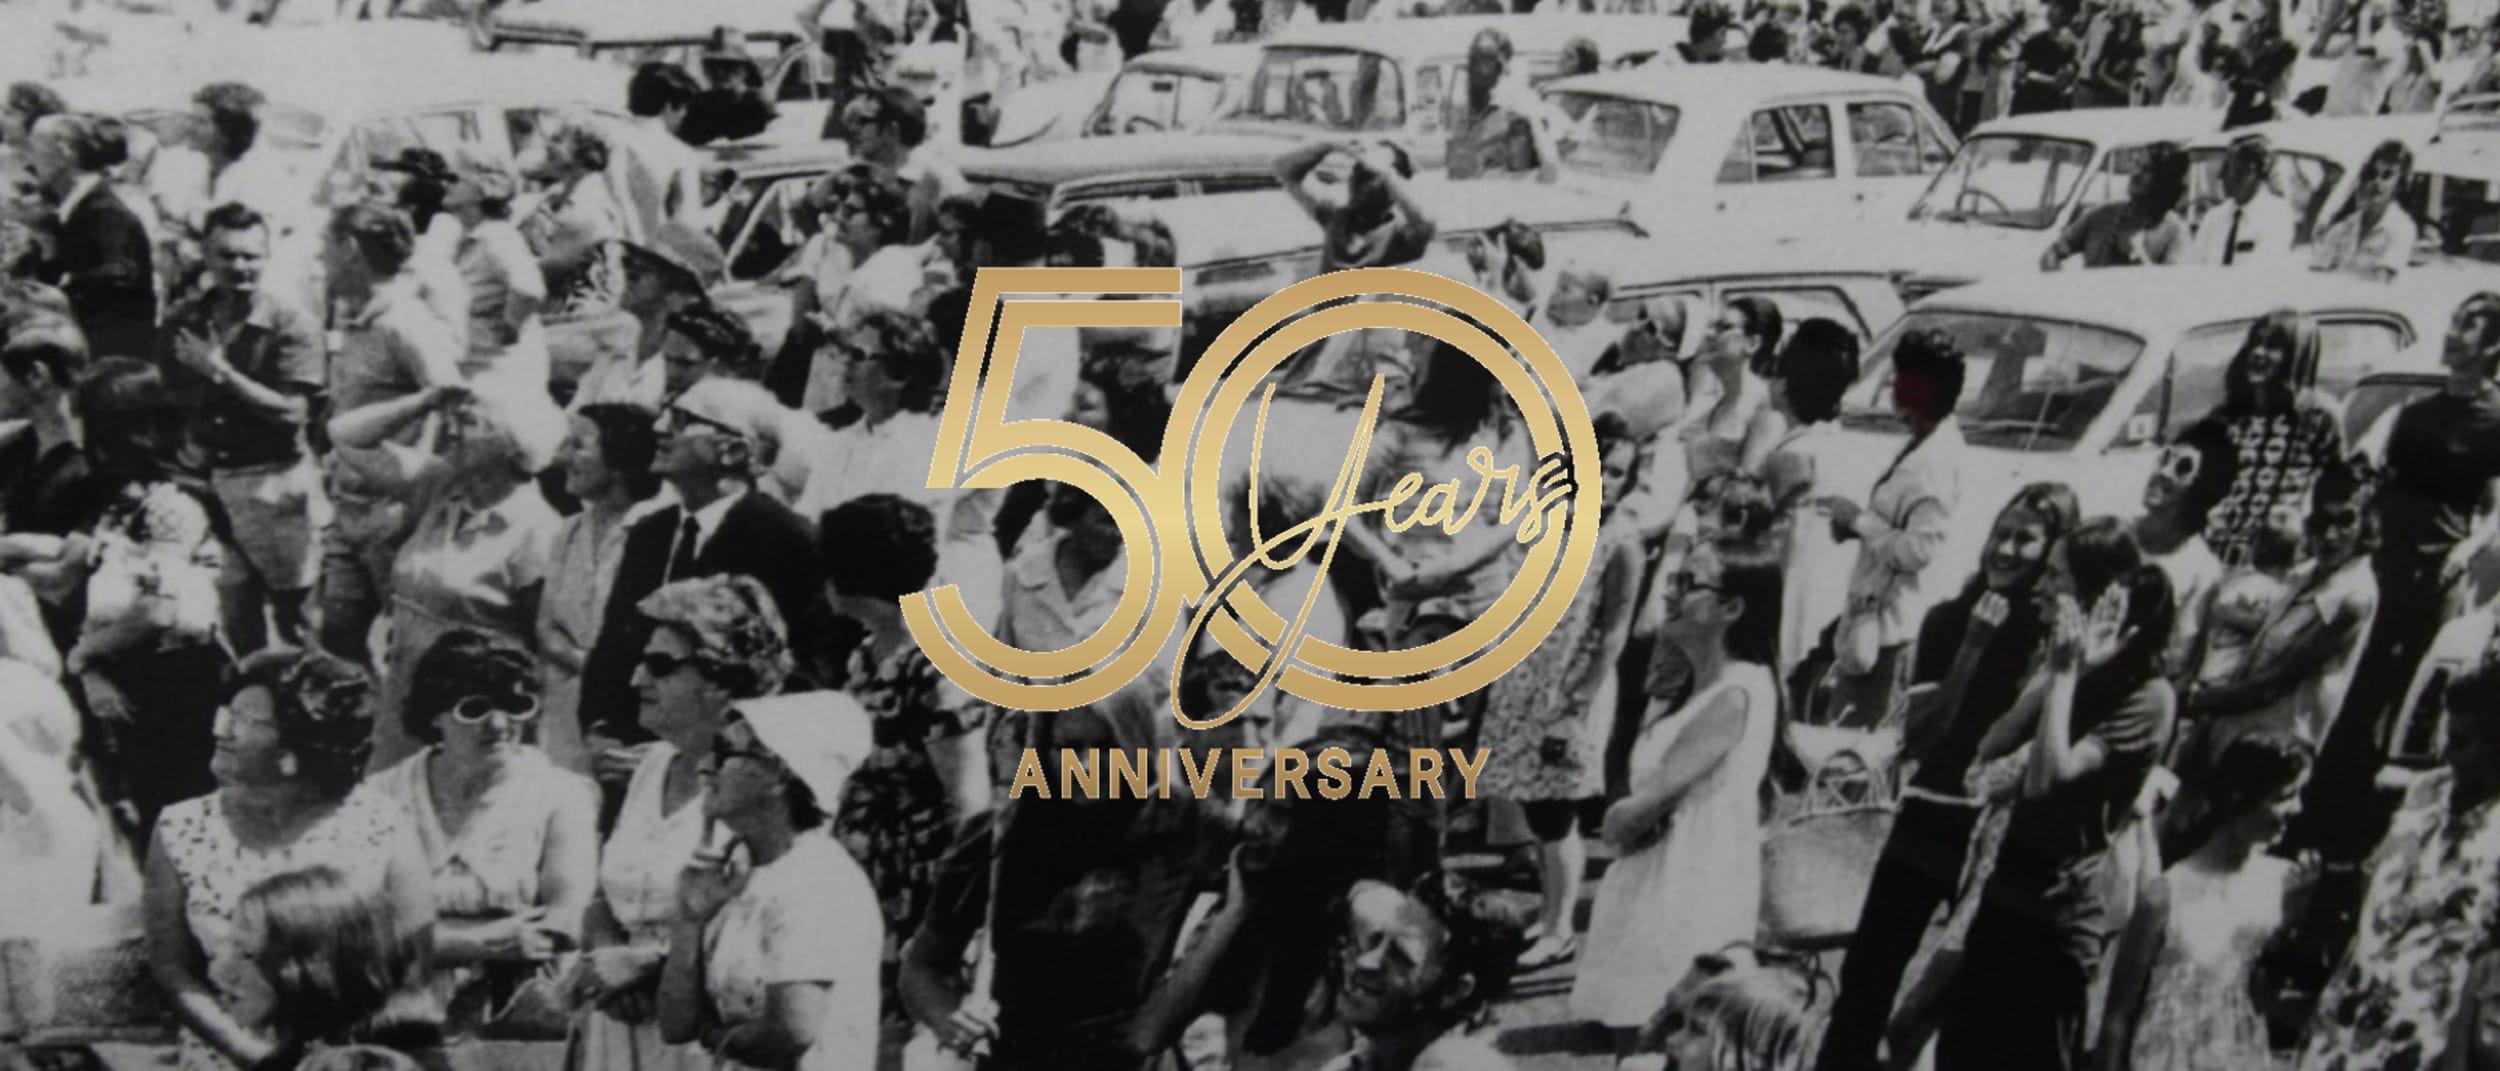 Celebrate 50 years of Garden City